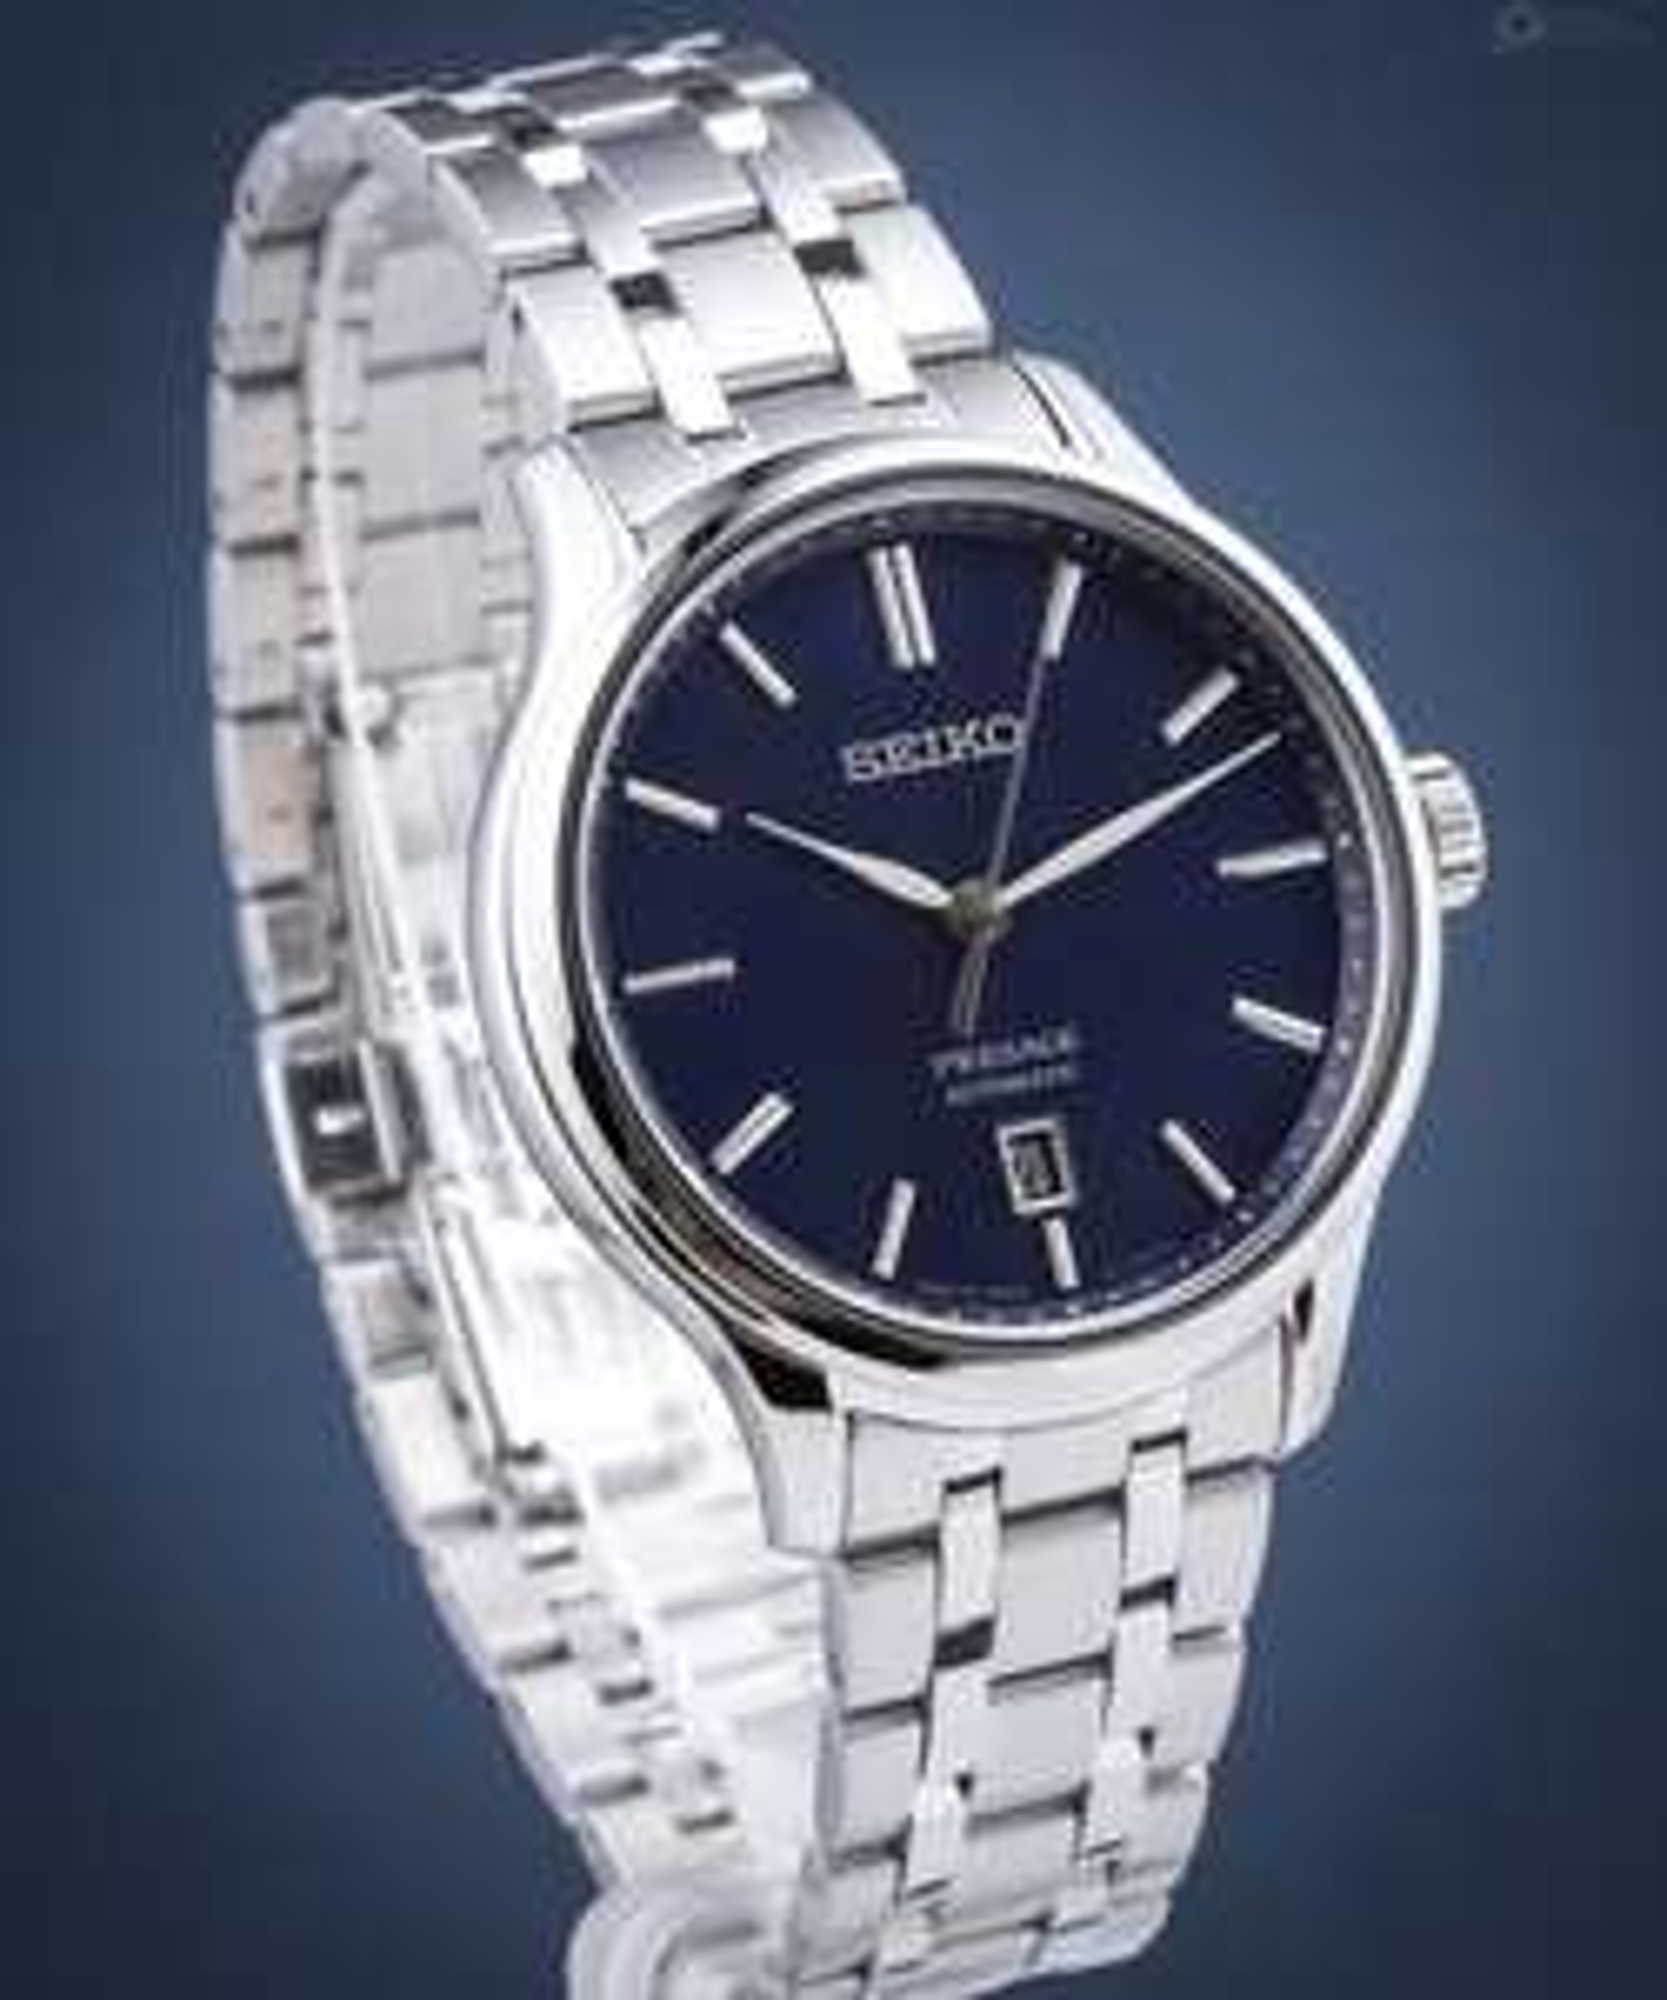 Seiko 41.7mm 4R35 Presage Watch Zen Gardens Mens Watch SRPD41J1 30M WR Sapphire Crystal, £270 @ CW Sellors